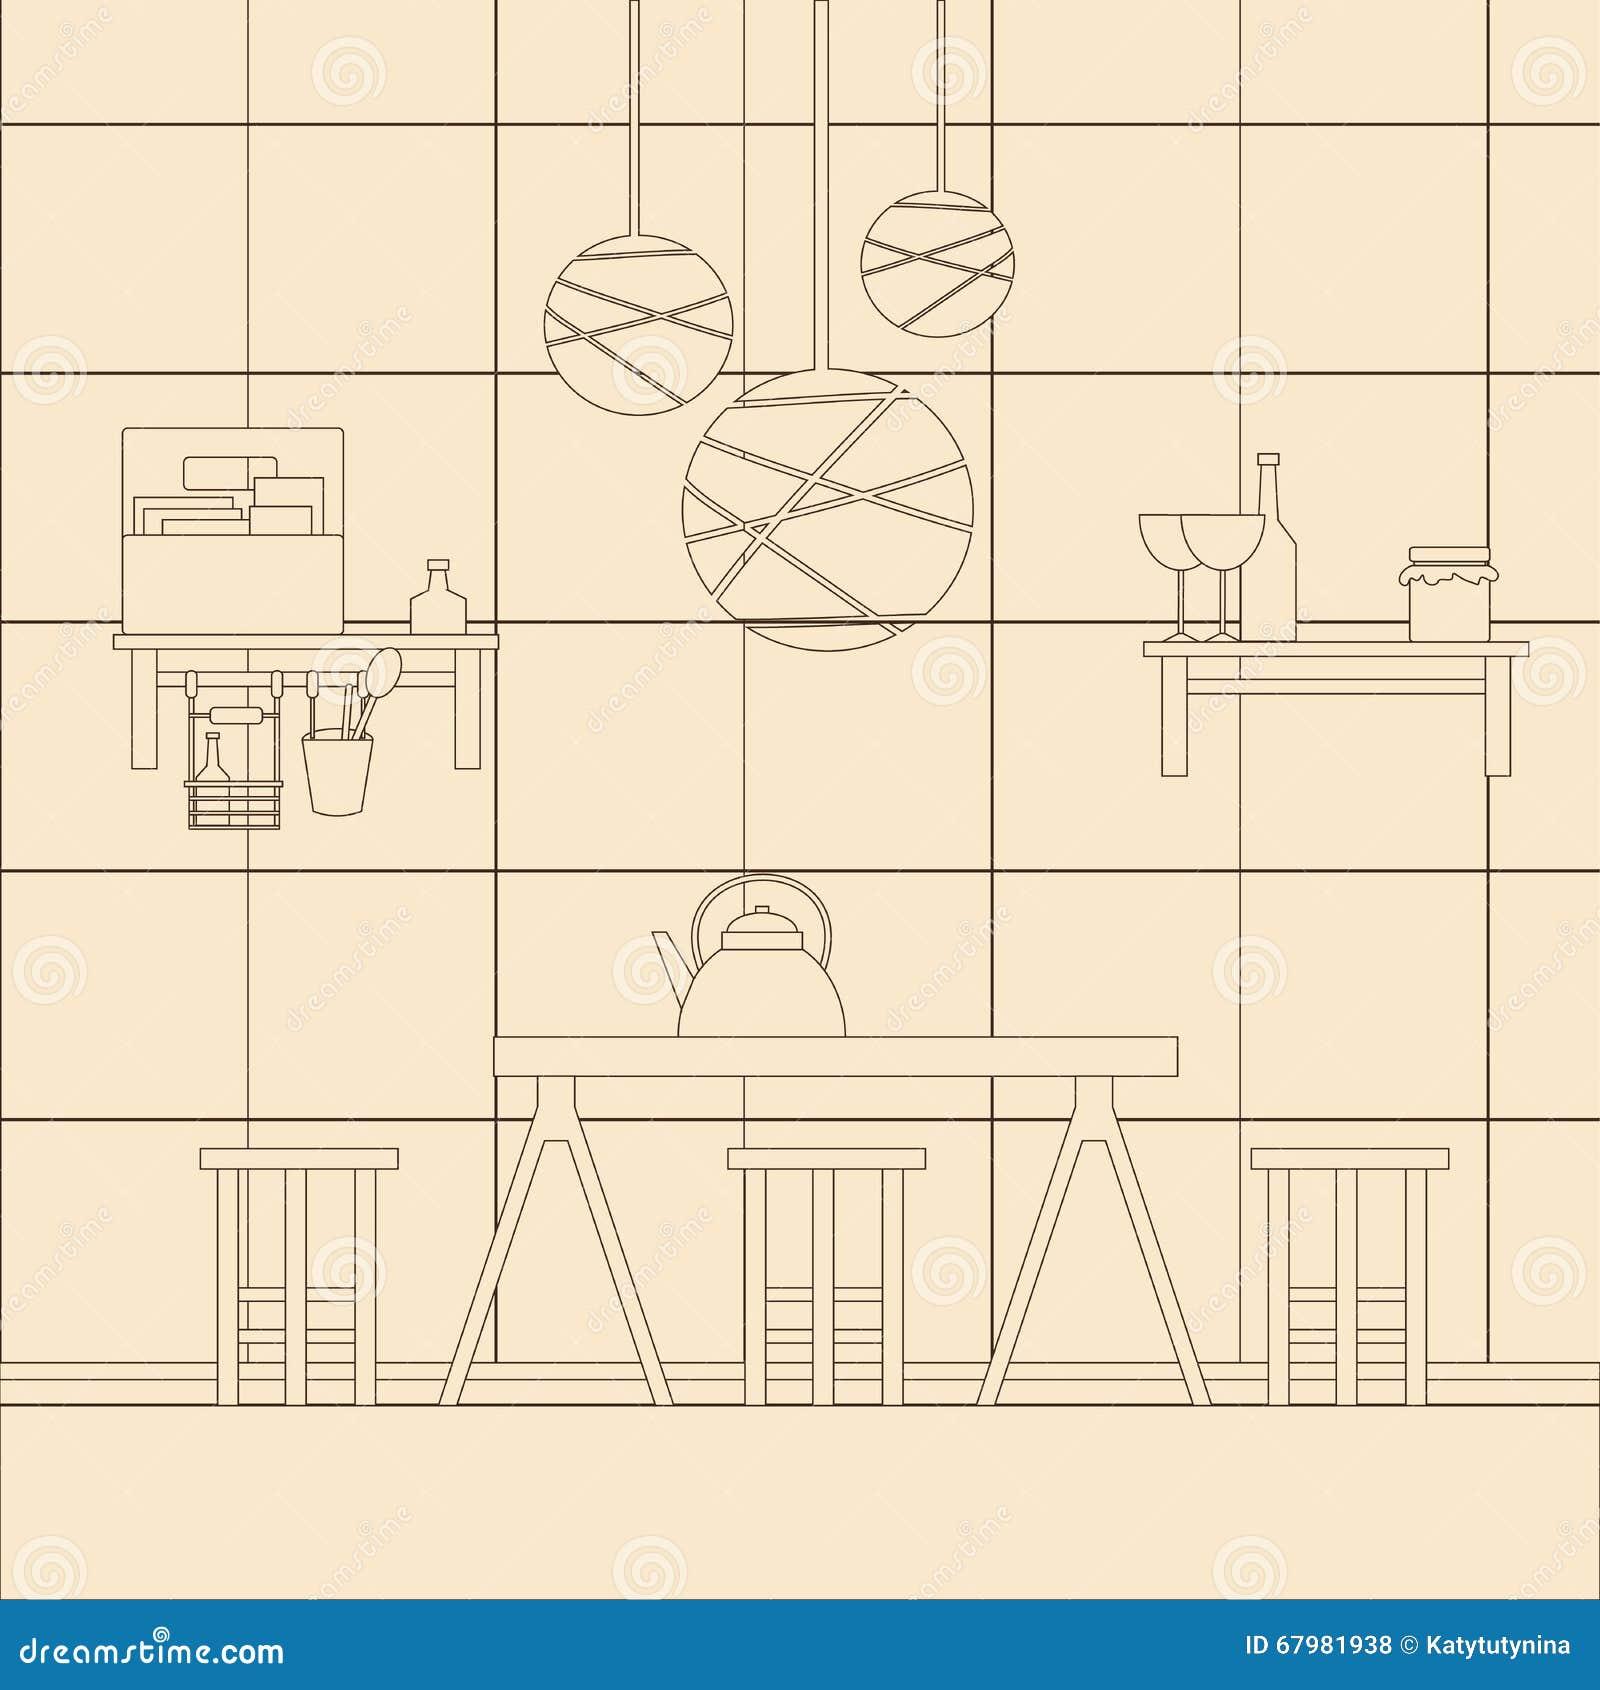 Vector illustration of kitchen interior design stock for Kitchen design template